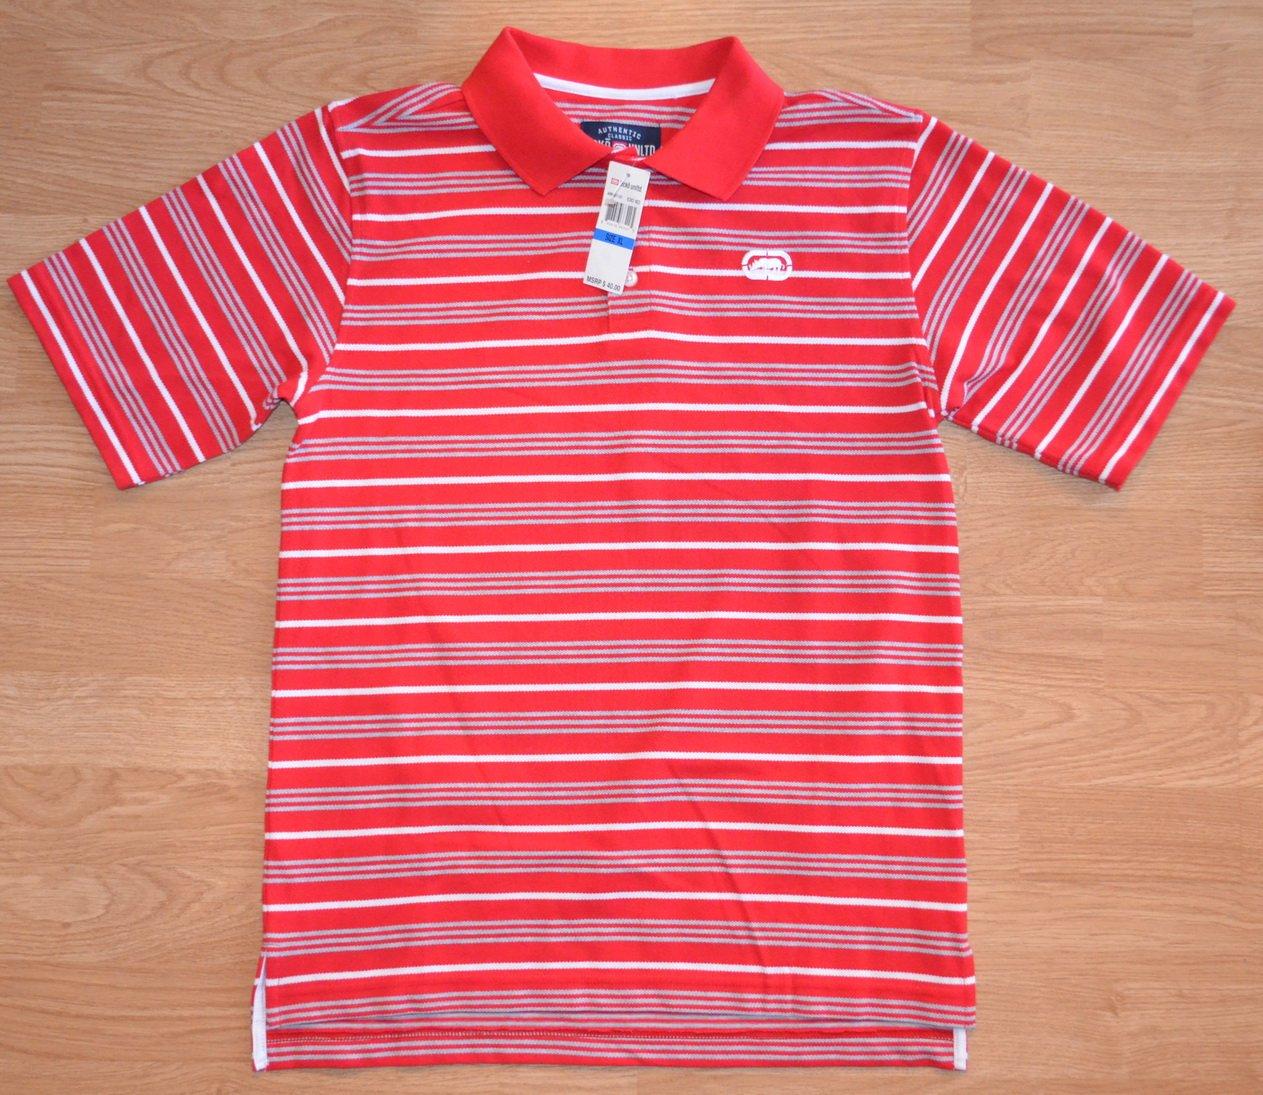 N988 New Boy's Polo shirt ECKO UNLTD Size XL MSRP $40.00